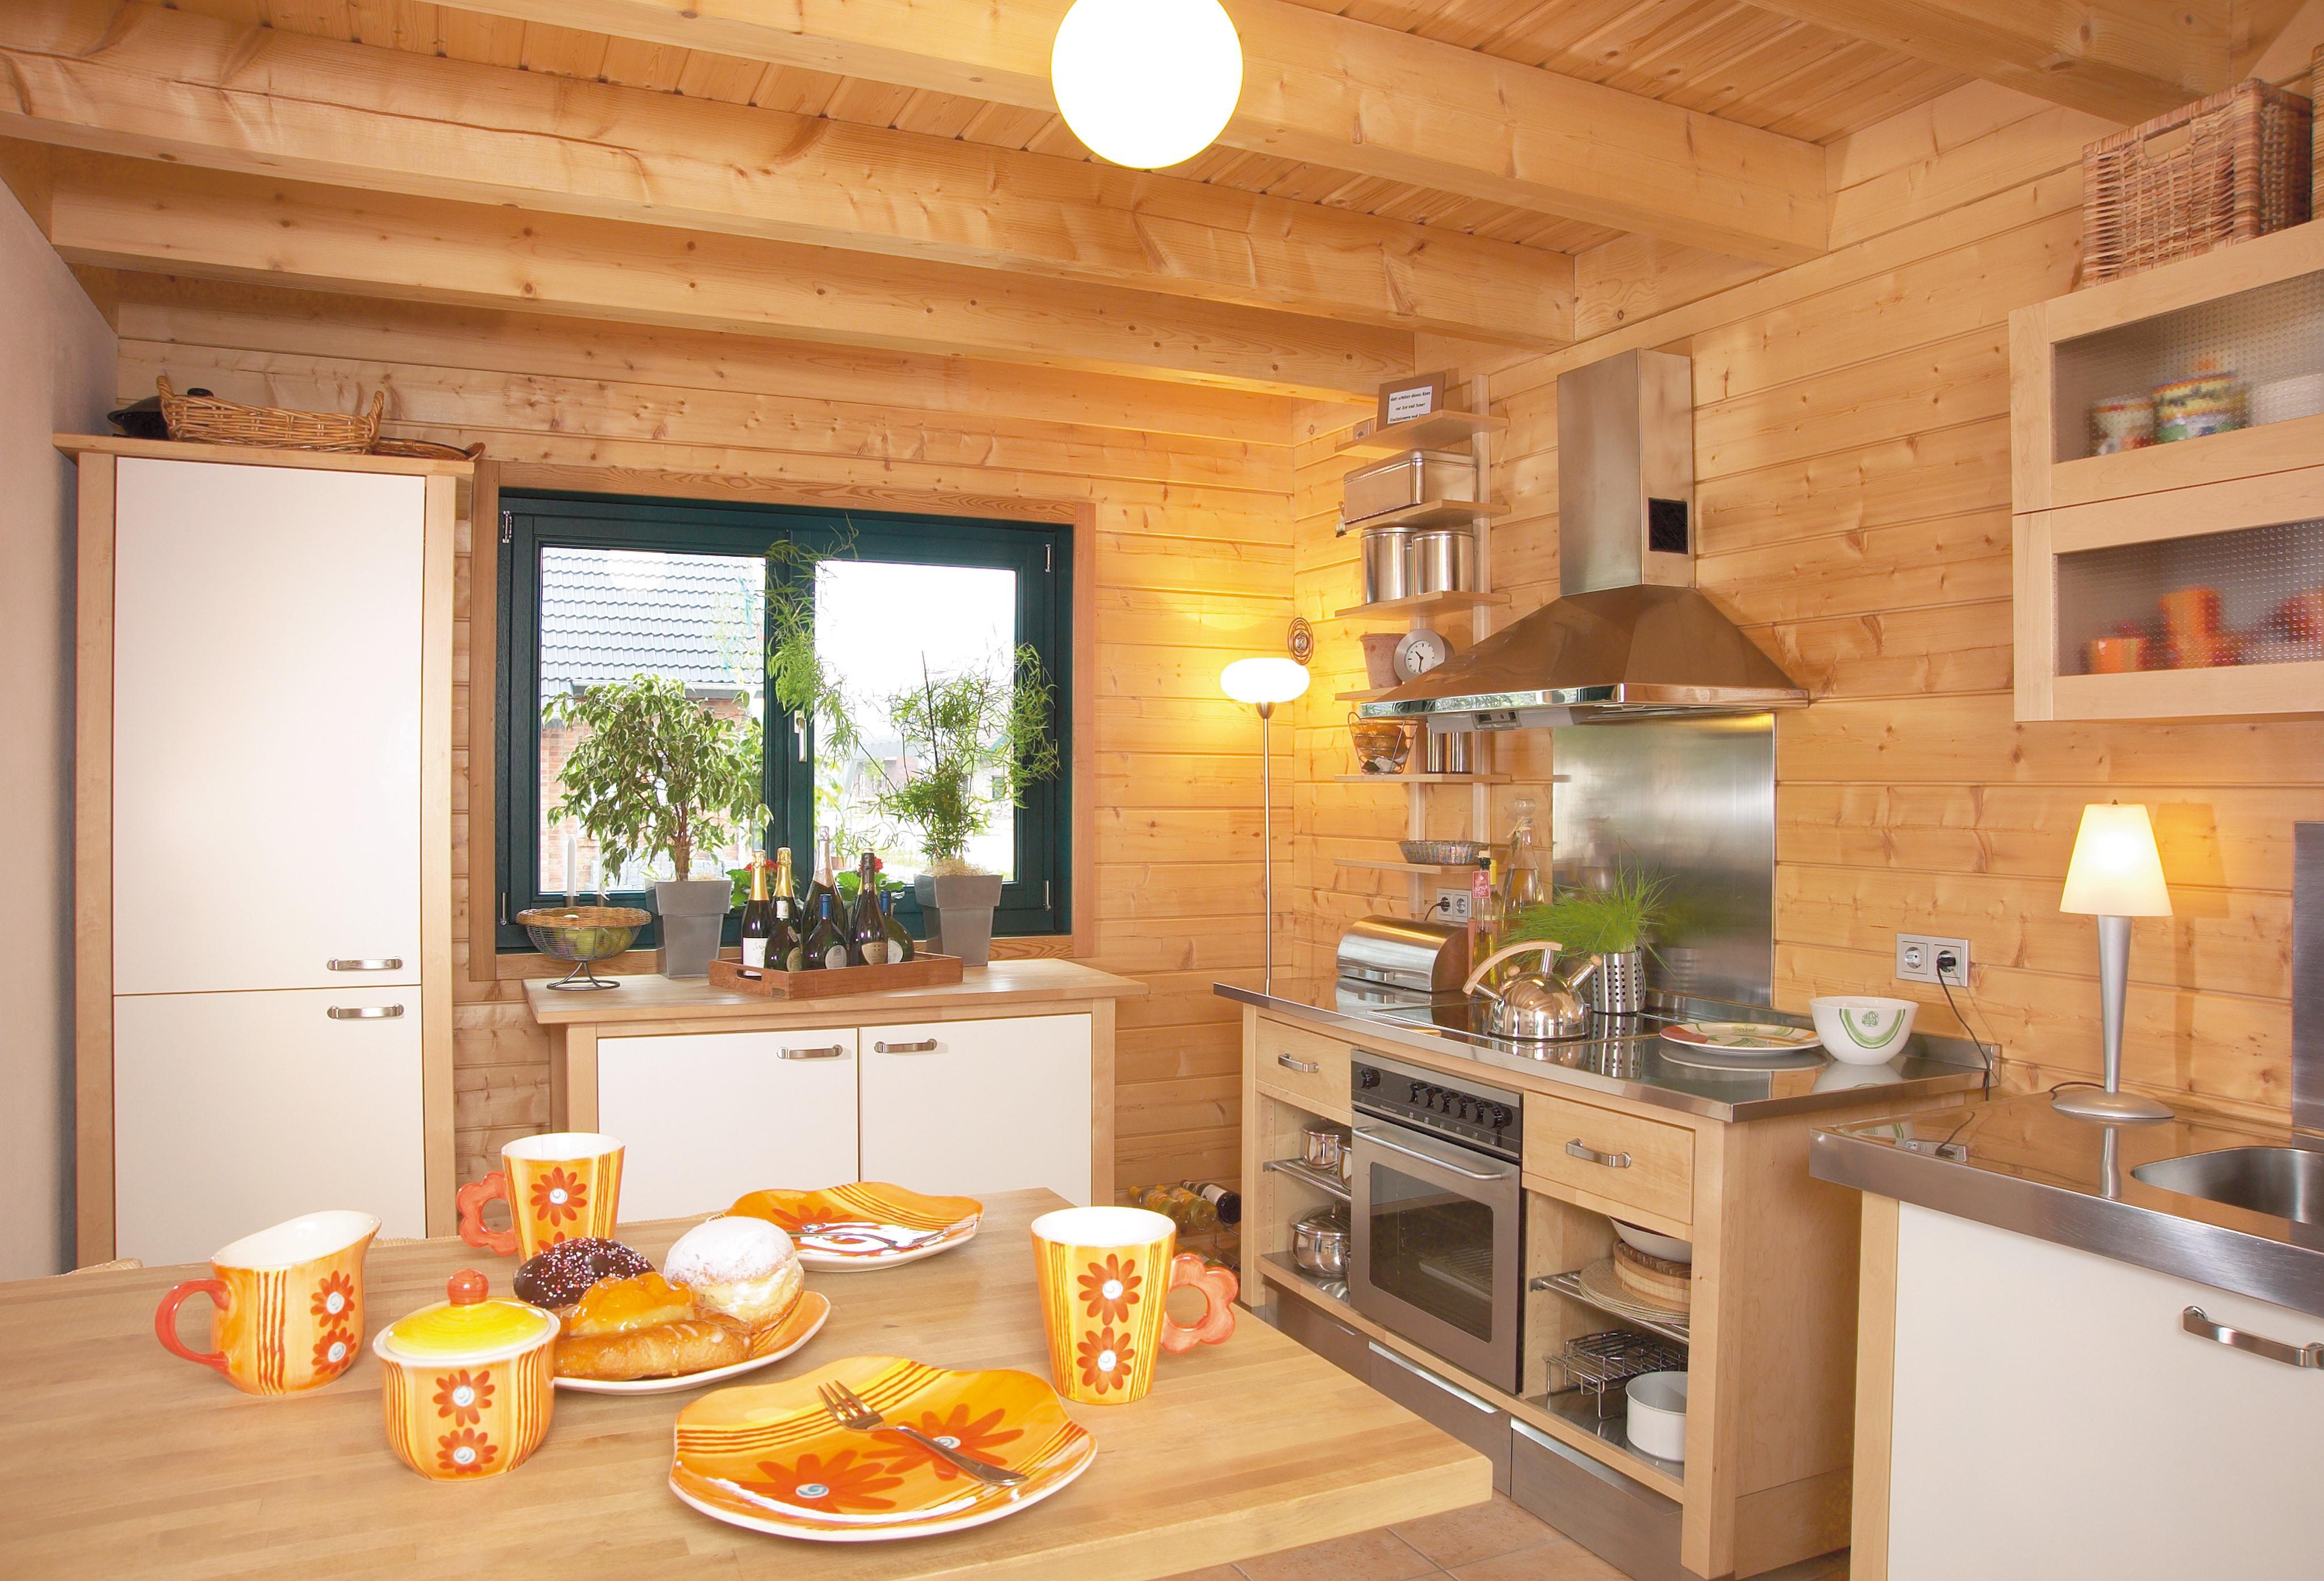 Wandpaneele Kuche Landhausstil – Caseconrad.com